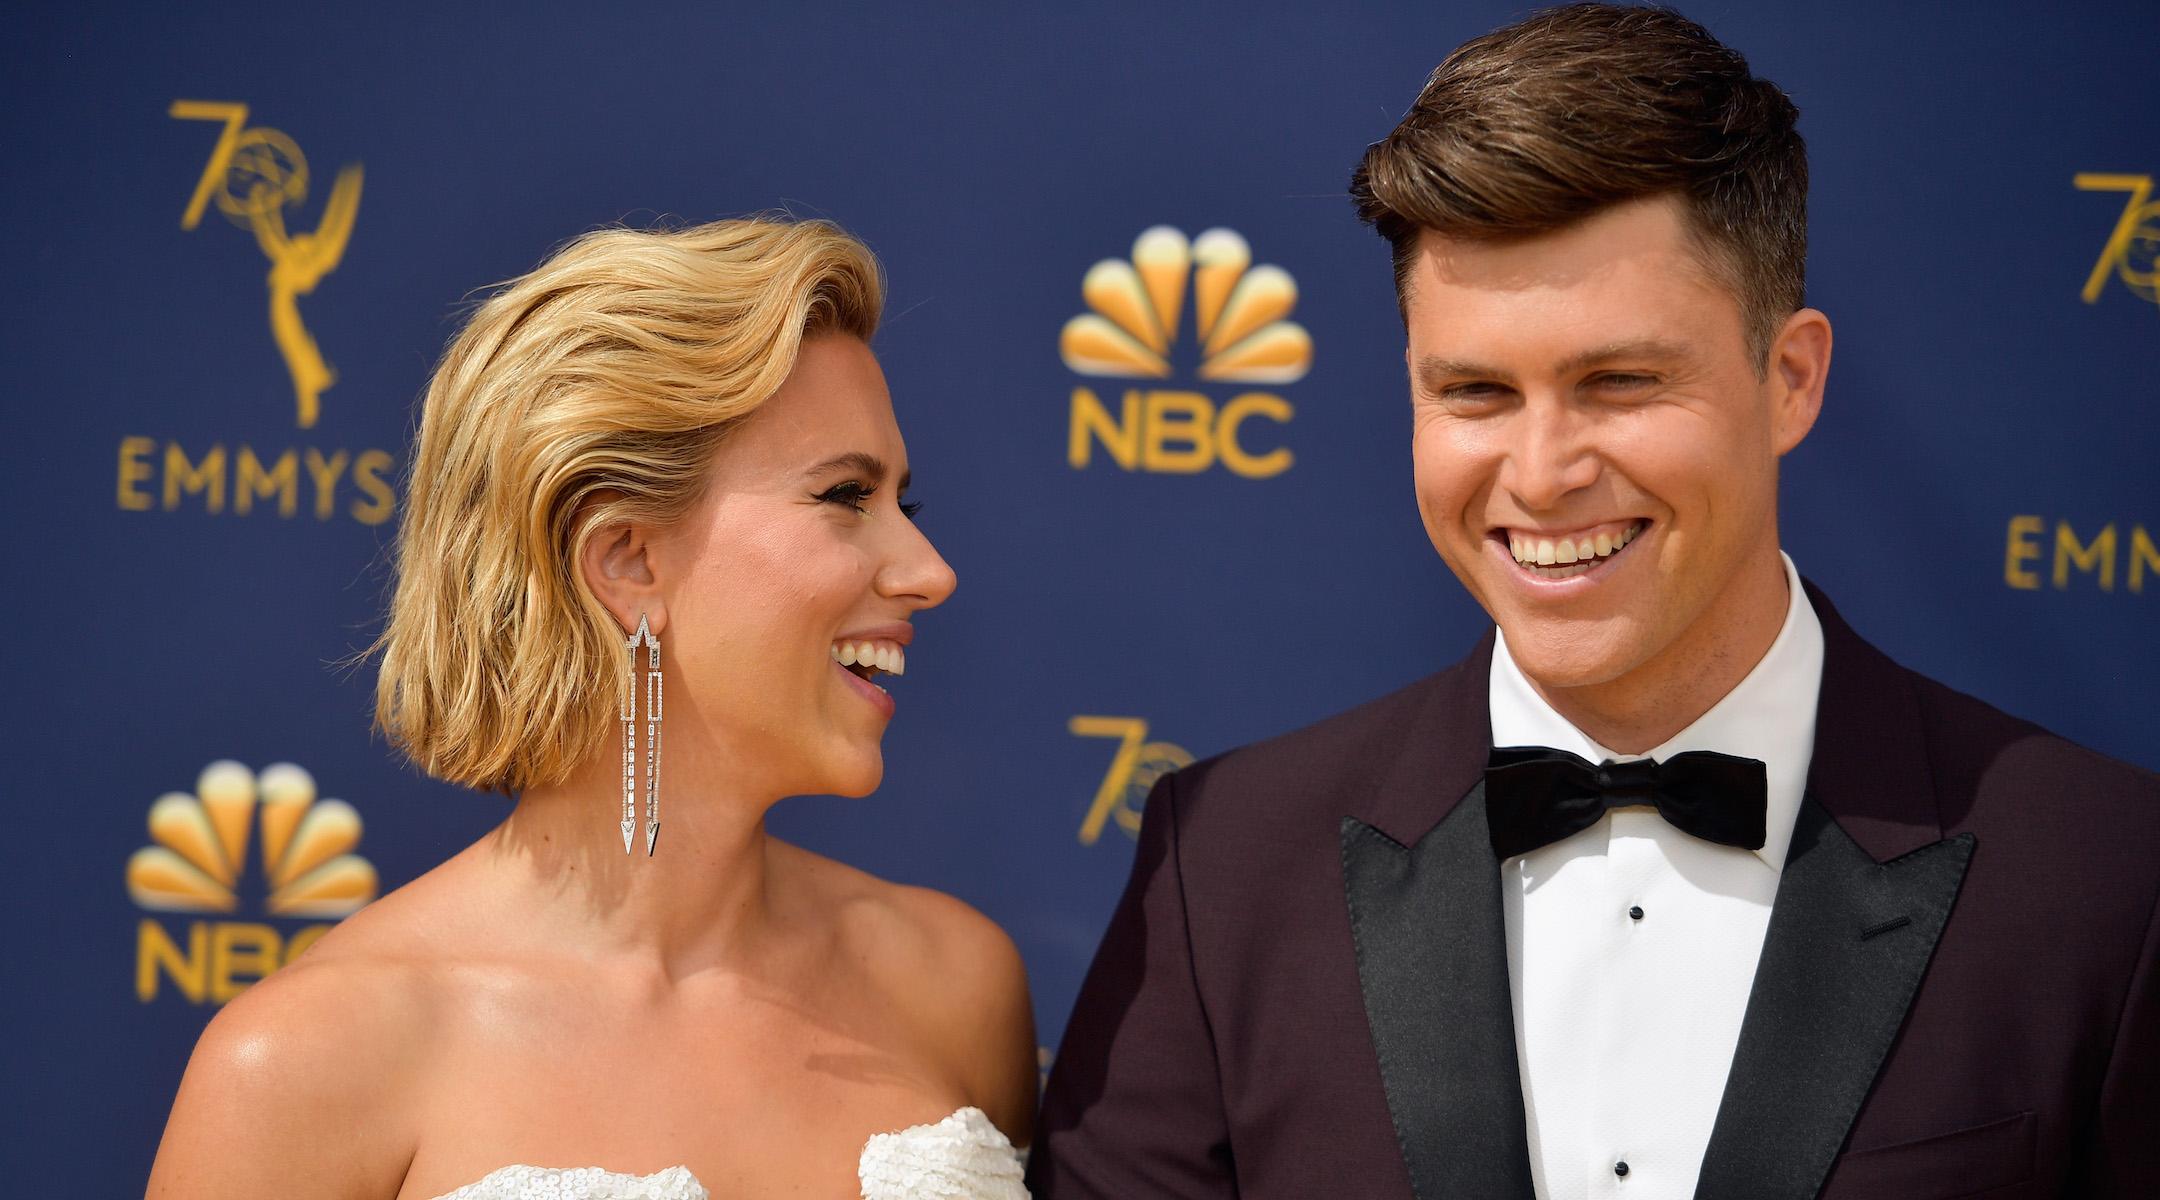 Scarlett Johansson and Colin Jost at the Emmy Awards in Los Angeles, Sept. 17, 2018. (Photo/JTA-Matt Winkelmeyer-Getty Images)